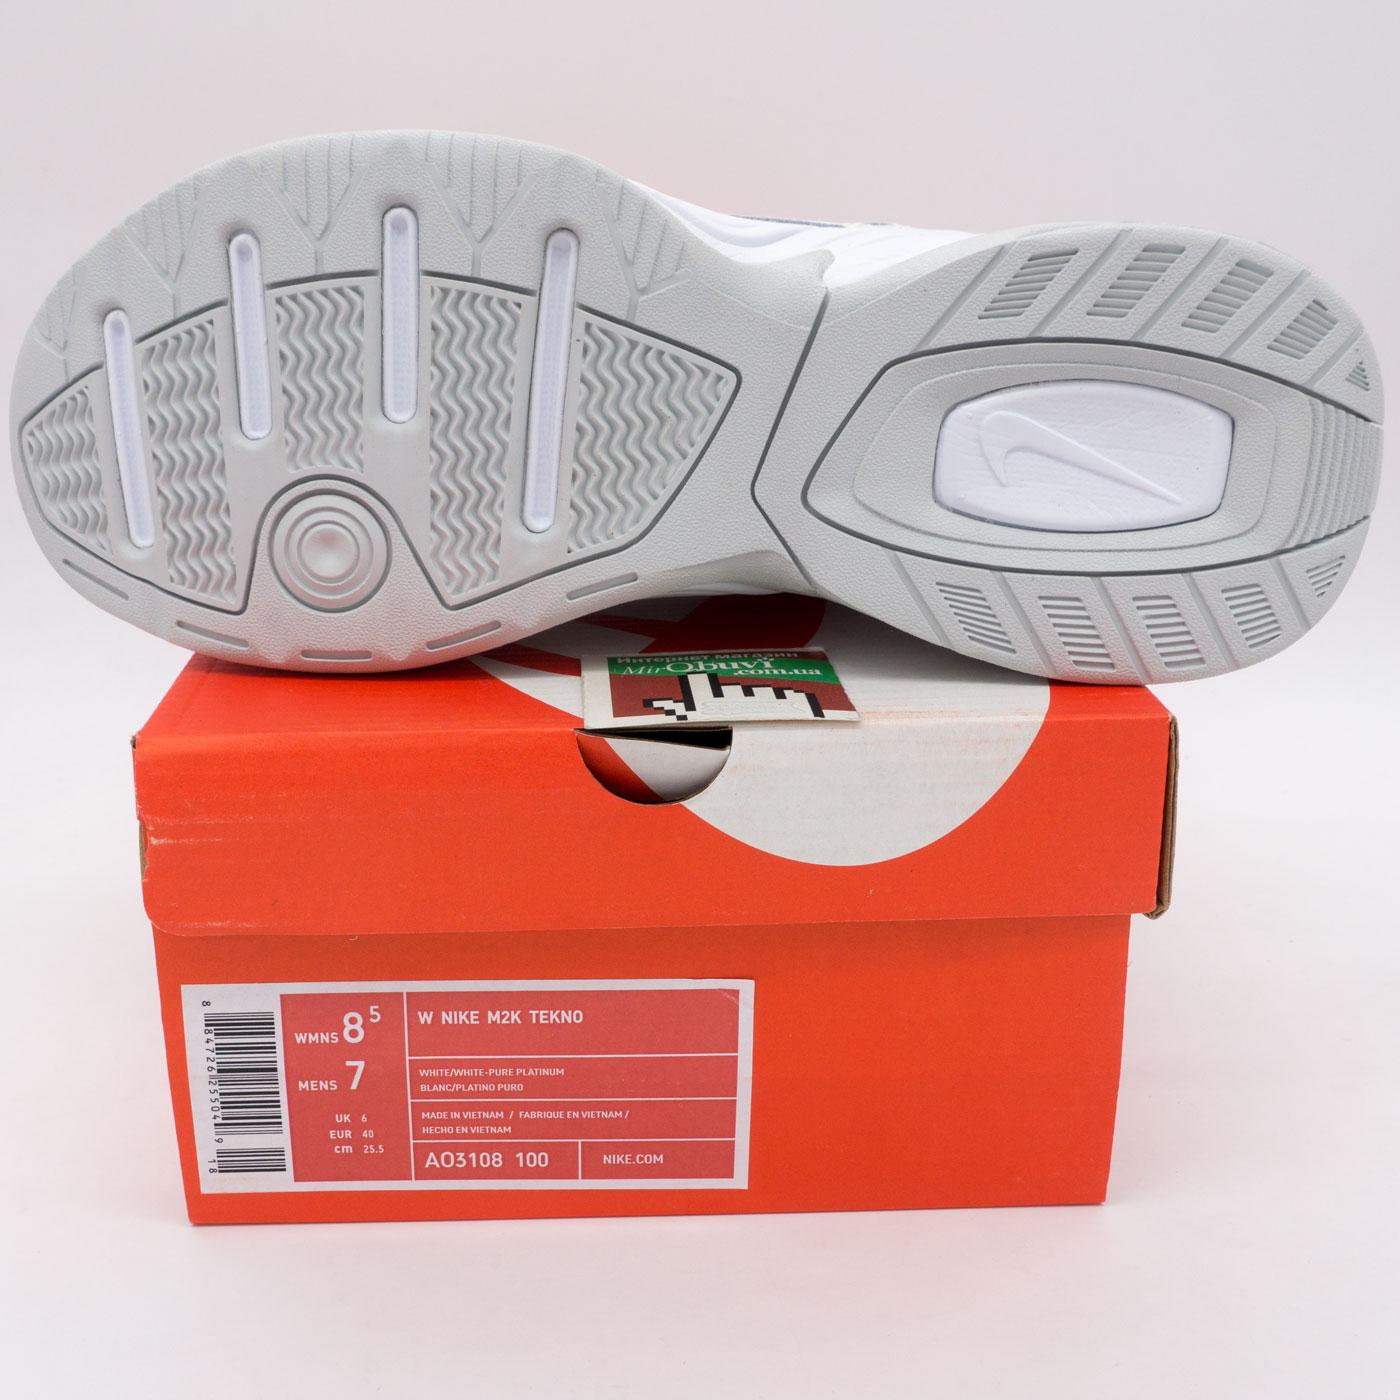 фото back Кроссовки Nike M2K Tekno полностью белые. Топ качество! back